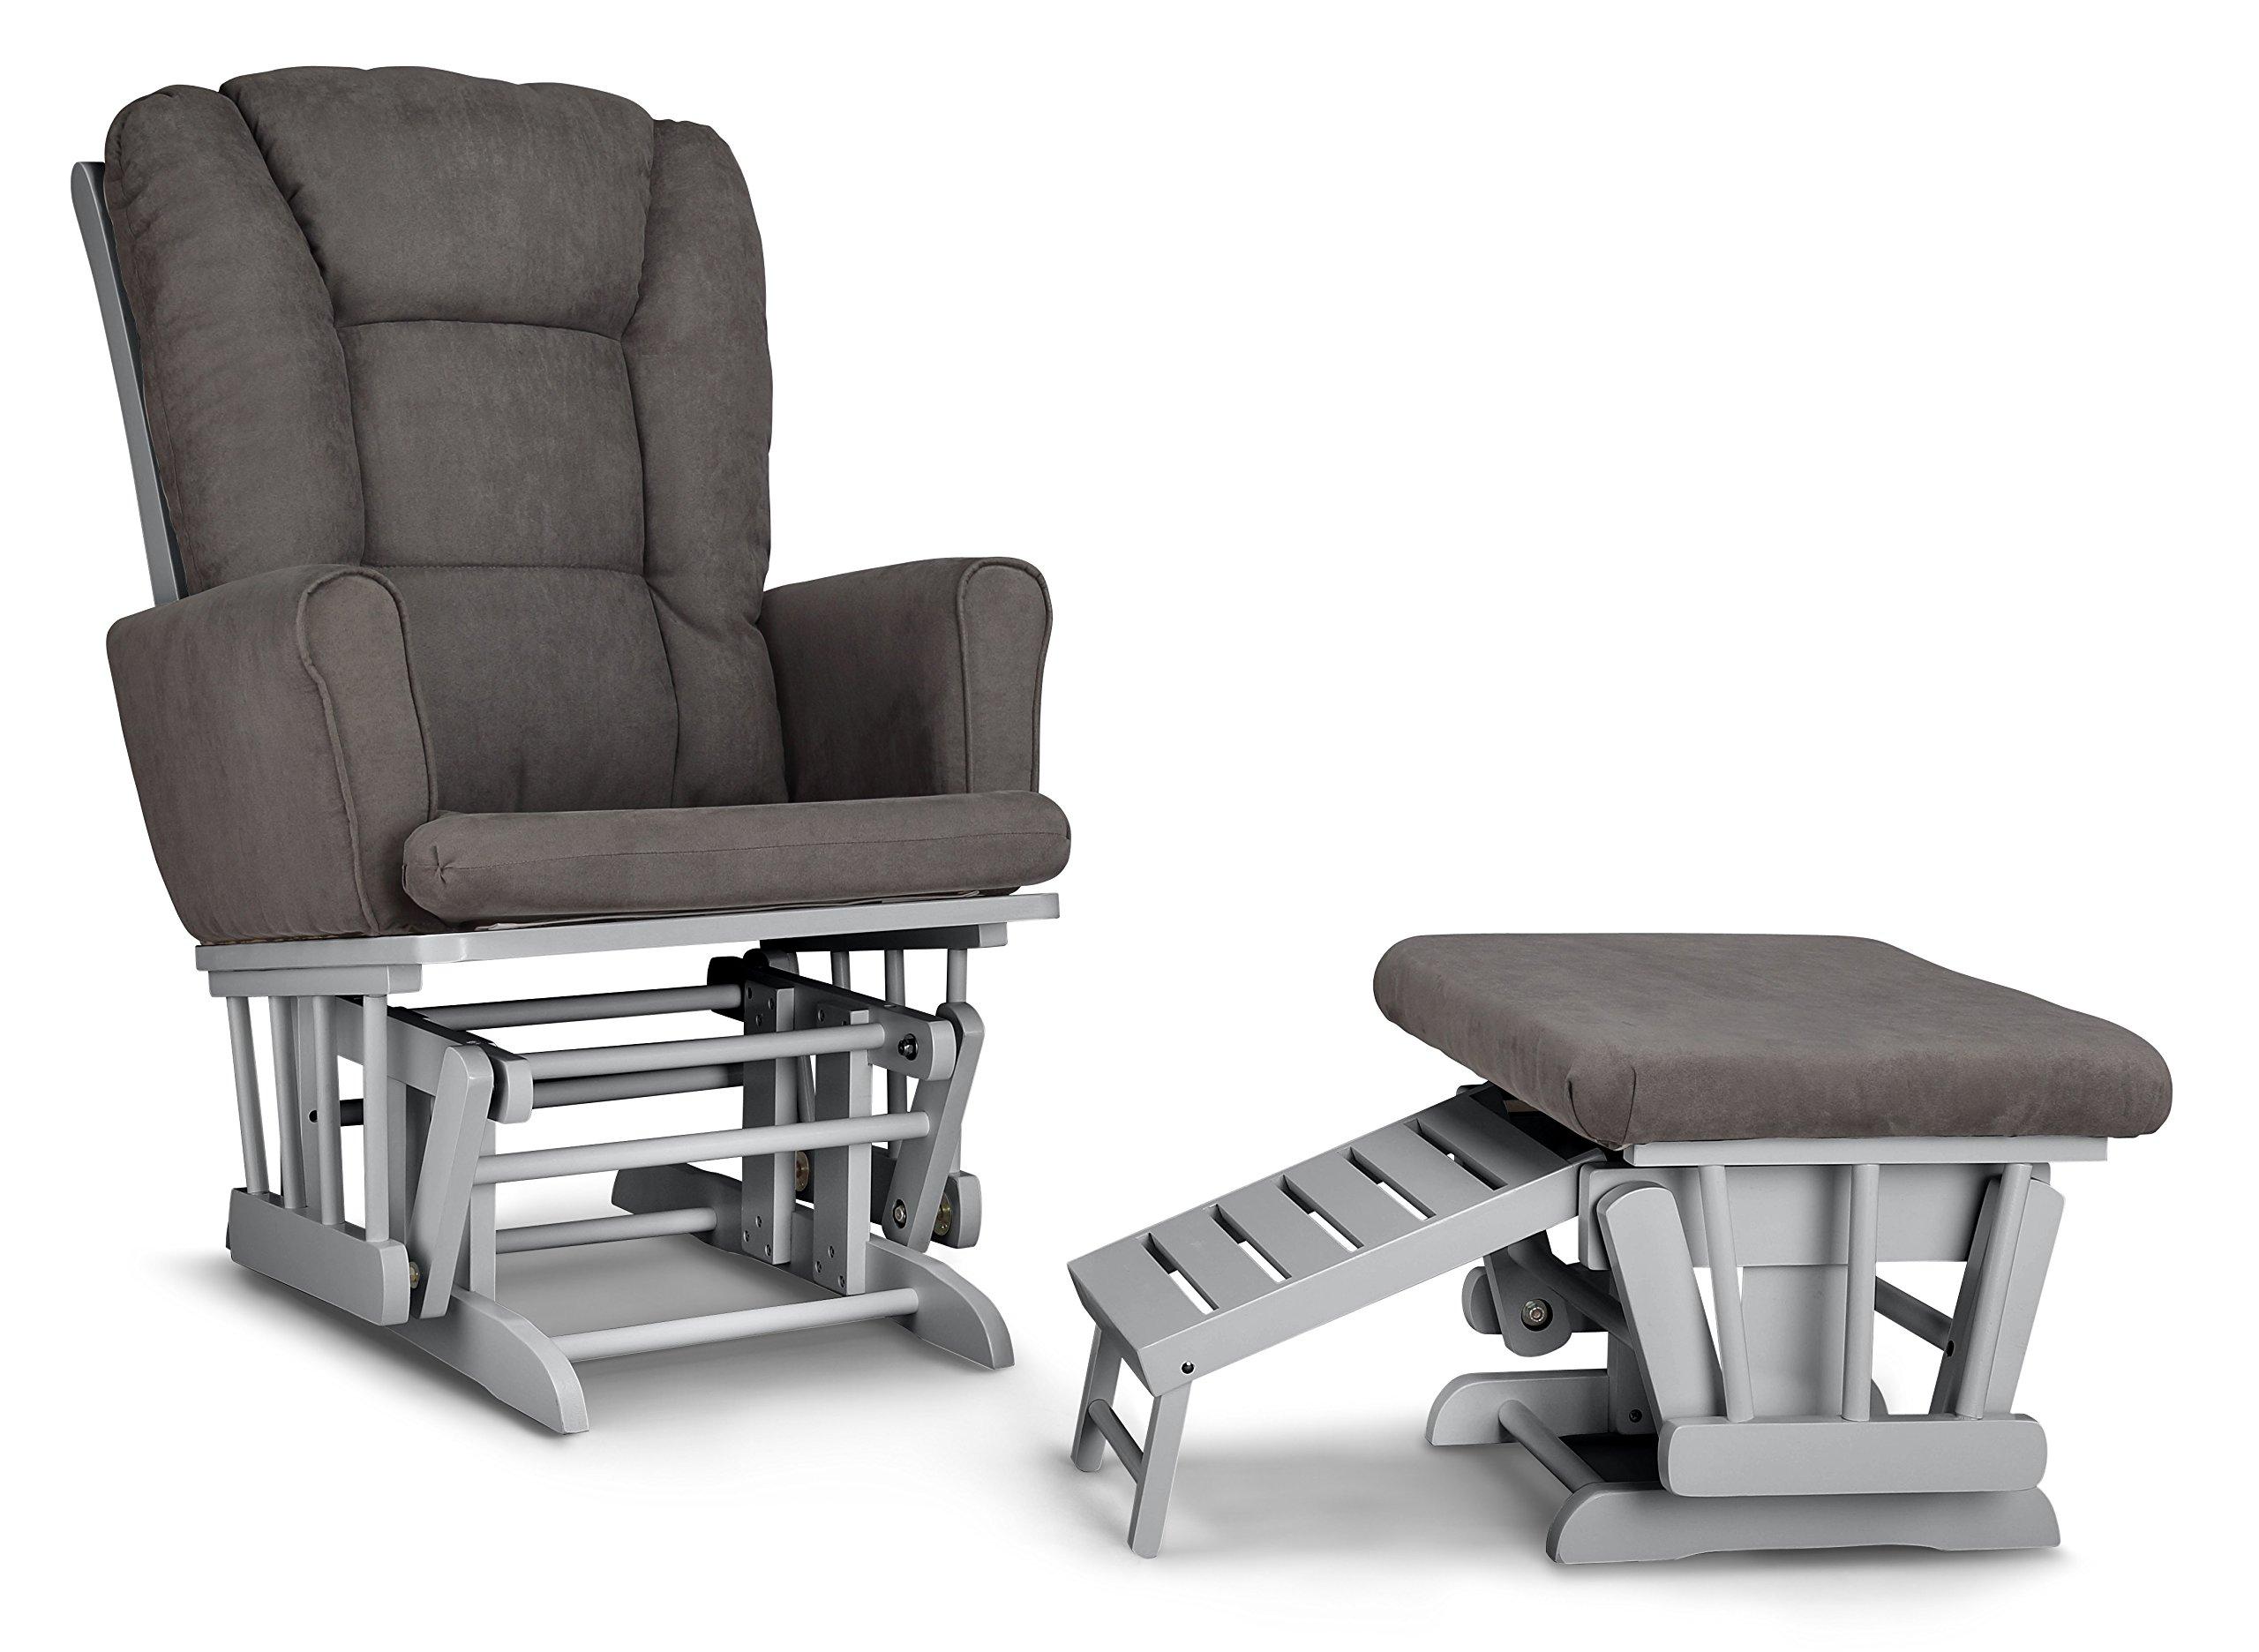 Graco Sterling Semi Upholstered Glider and Nursing Ottoman, Pebble Gray/Gray